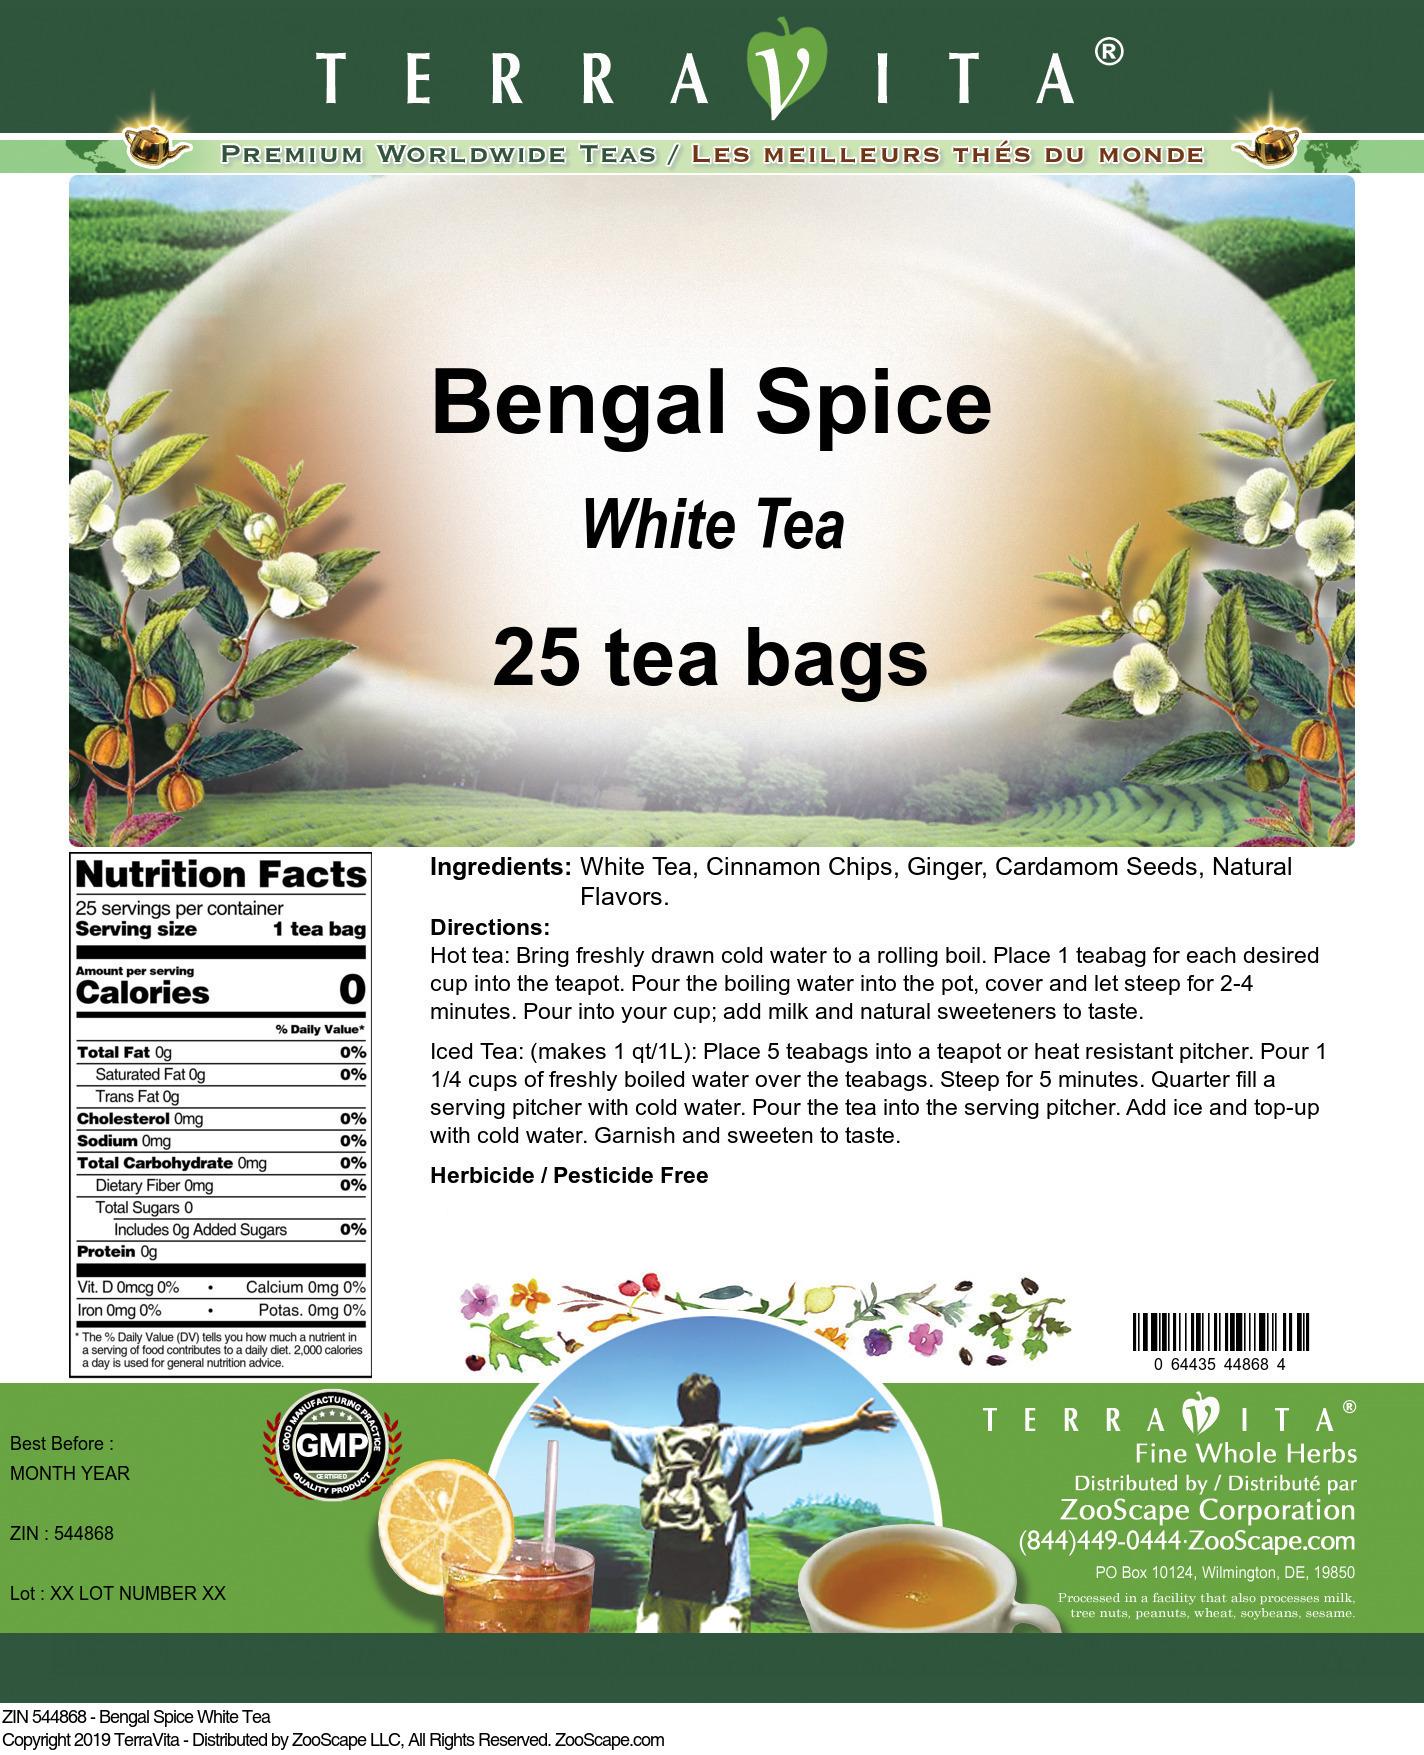 Bengal Spice White Tea